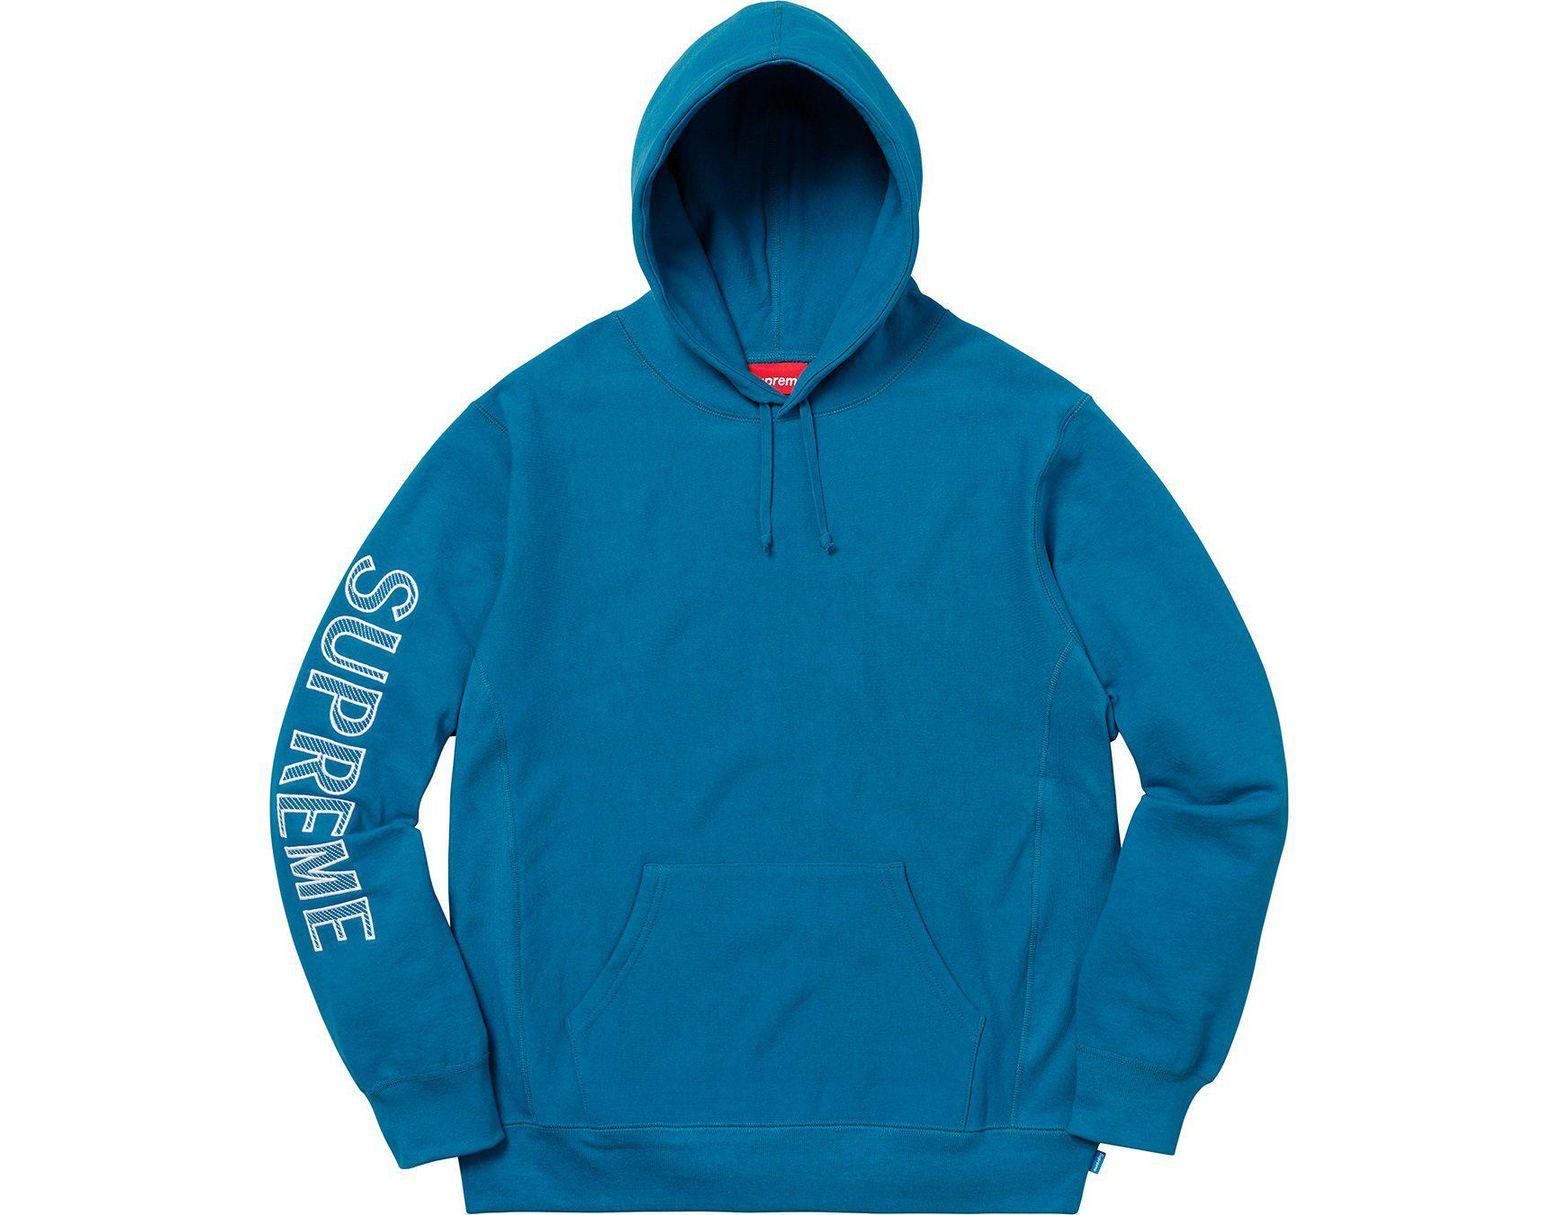 eb98e3e9 Supreme Sleeve Embroidery Hooded Sweatshirt Dark Aqua in Blue for Men - Lyst